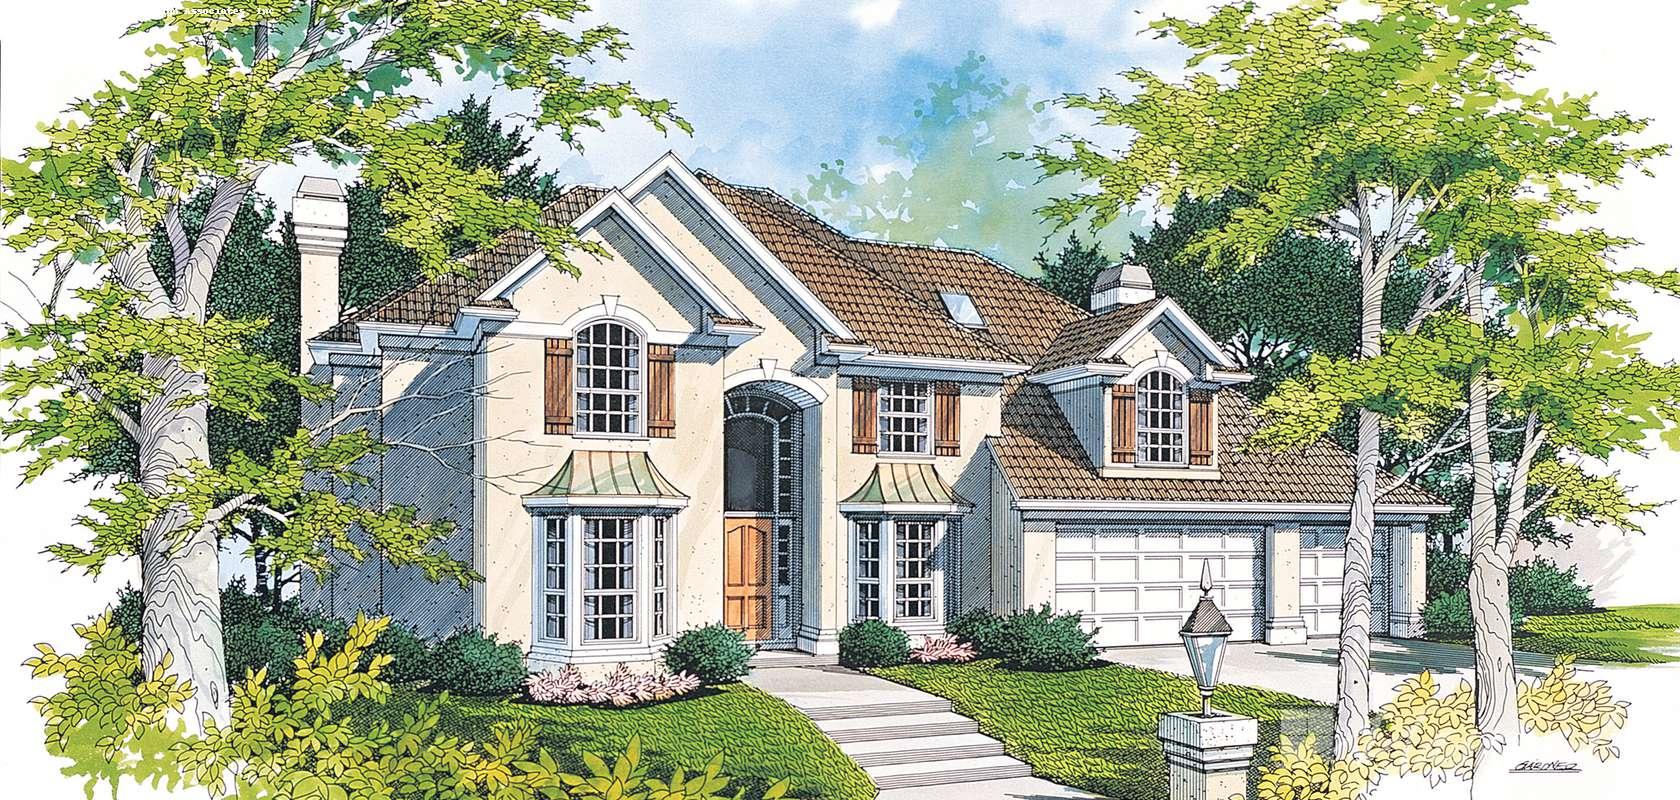 Mascord House Plan 2338: The Pierson